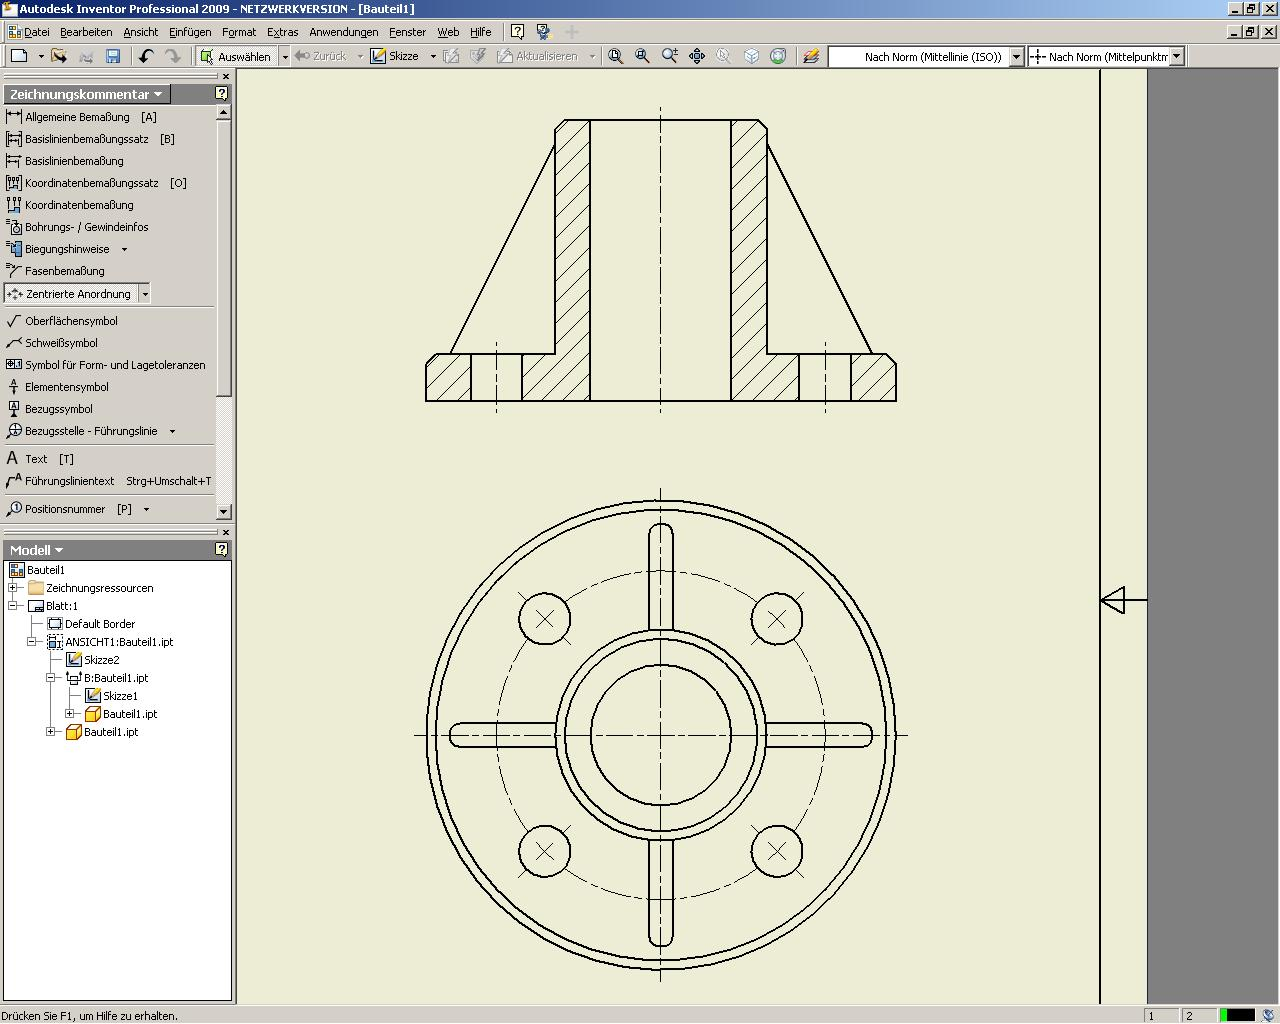 Autodesk Inventor Software